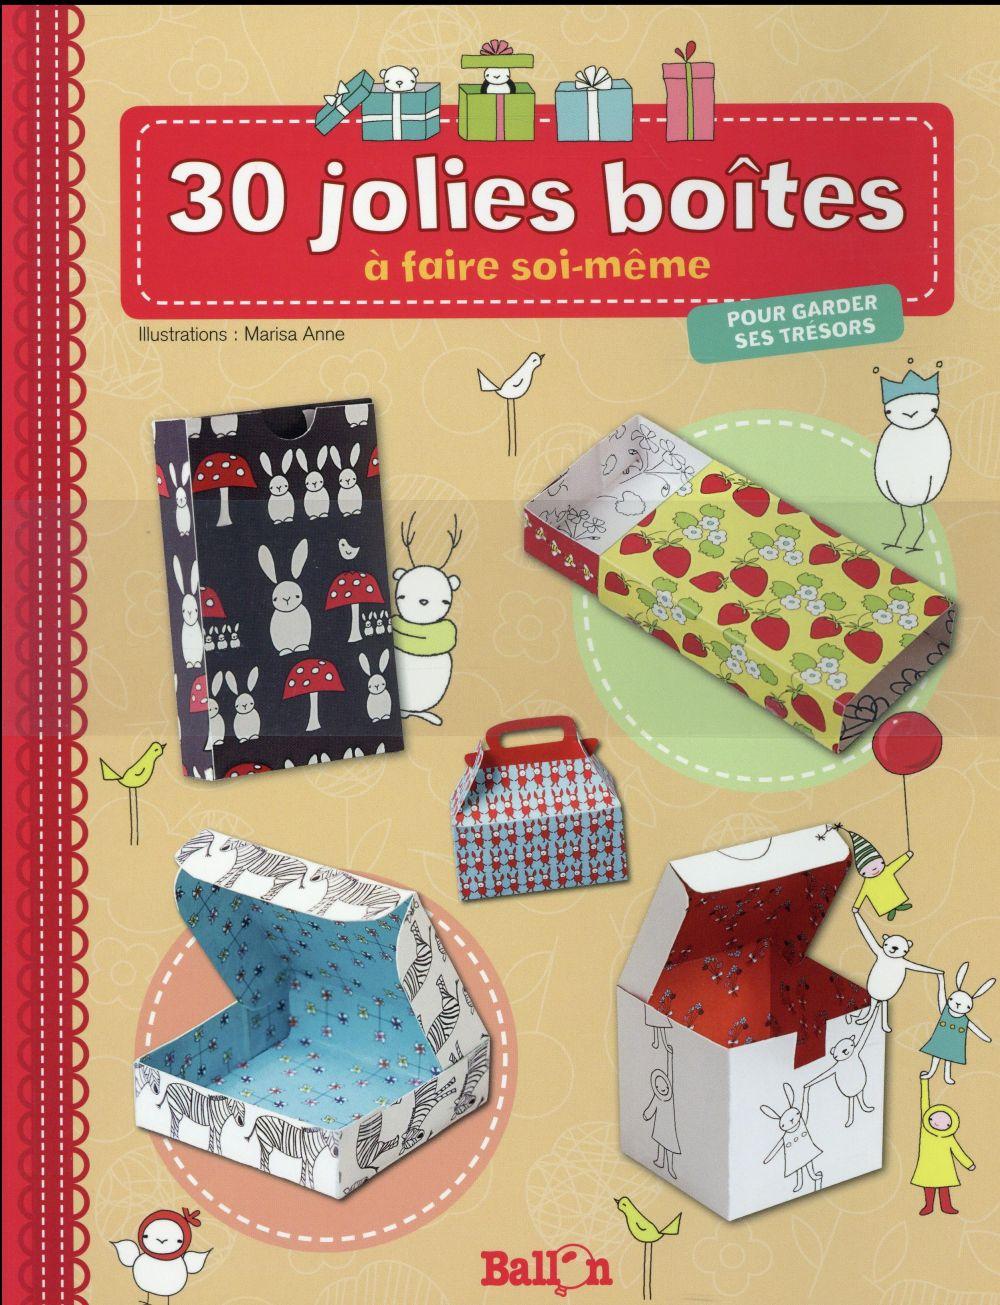 30 JOLIES BOITES POUR GARDER SES TRESORS